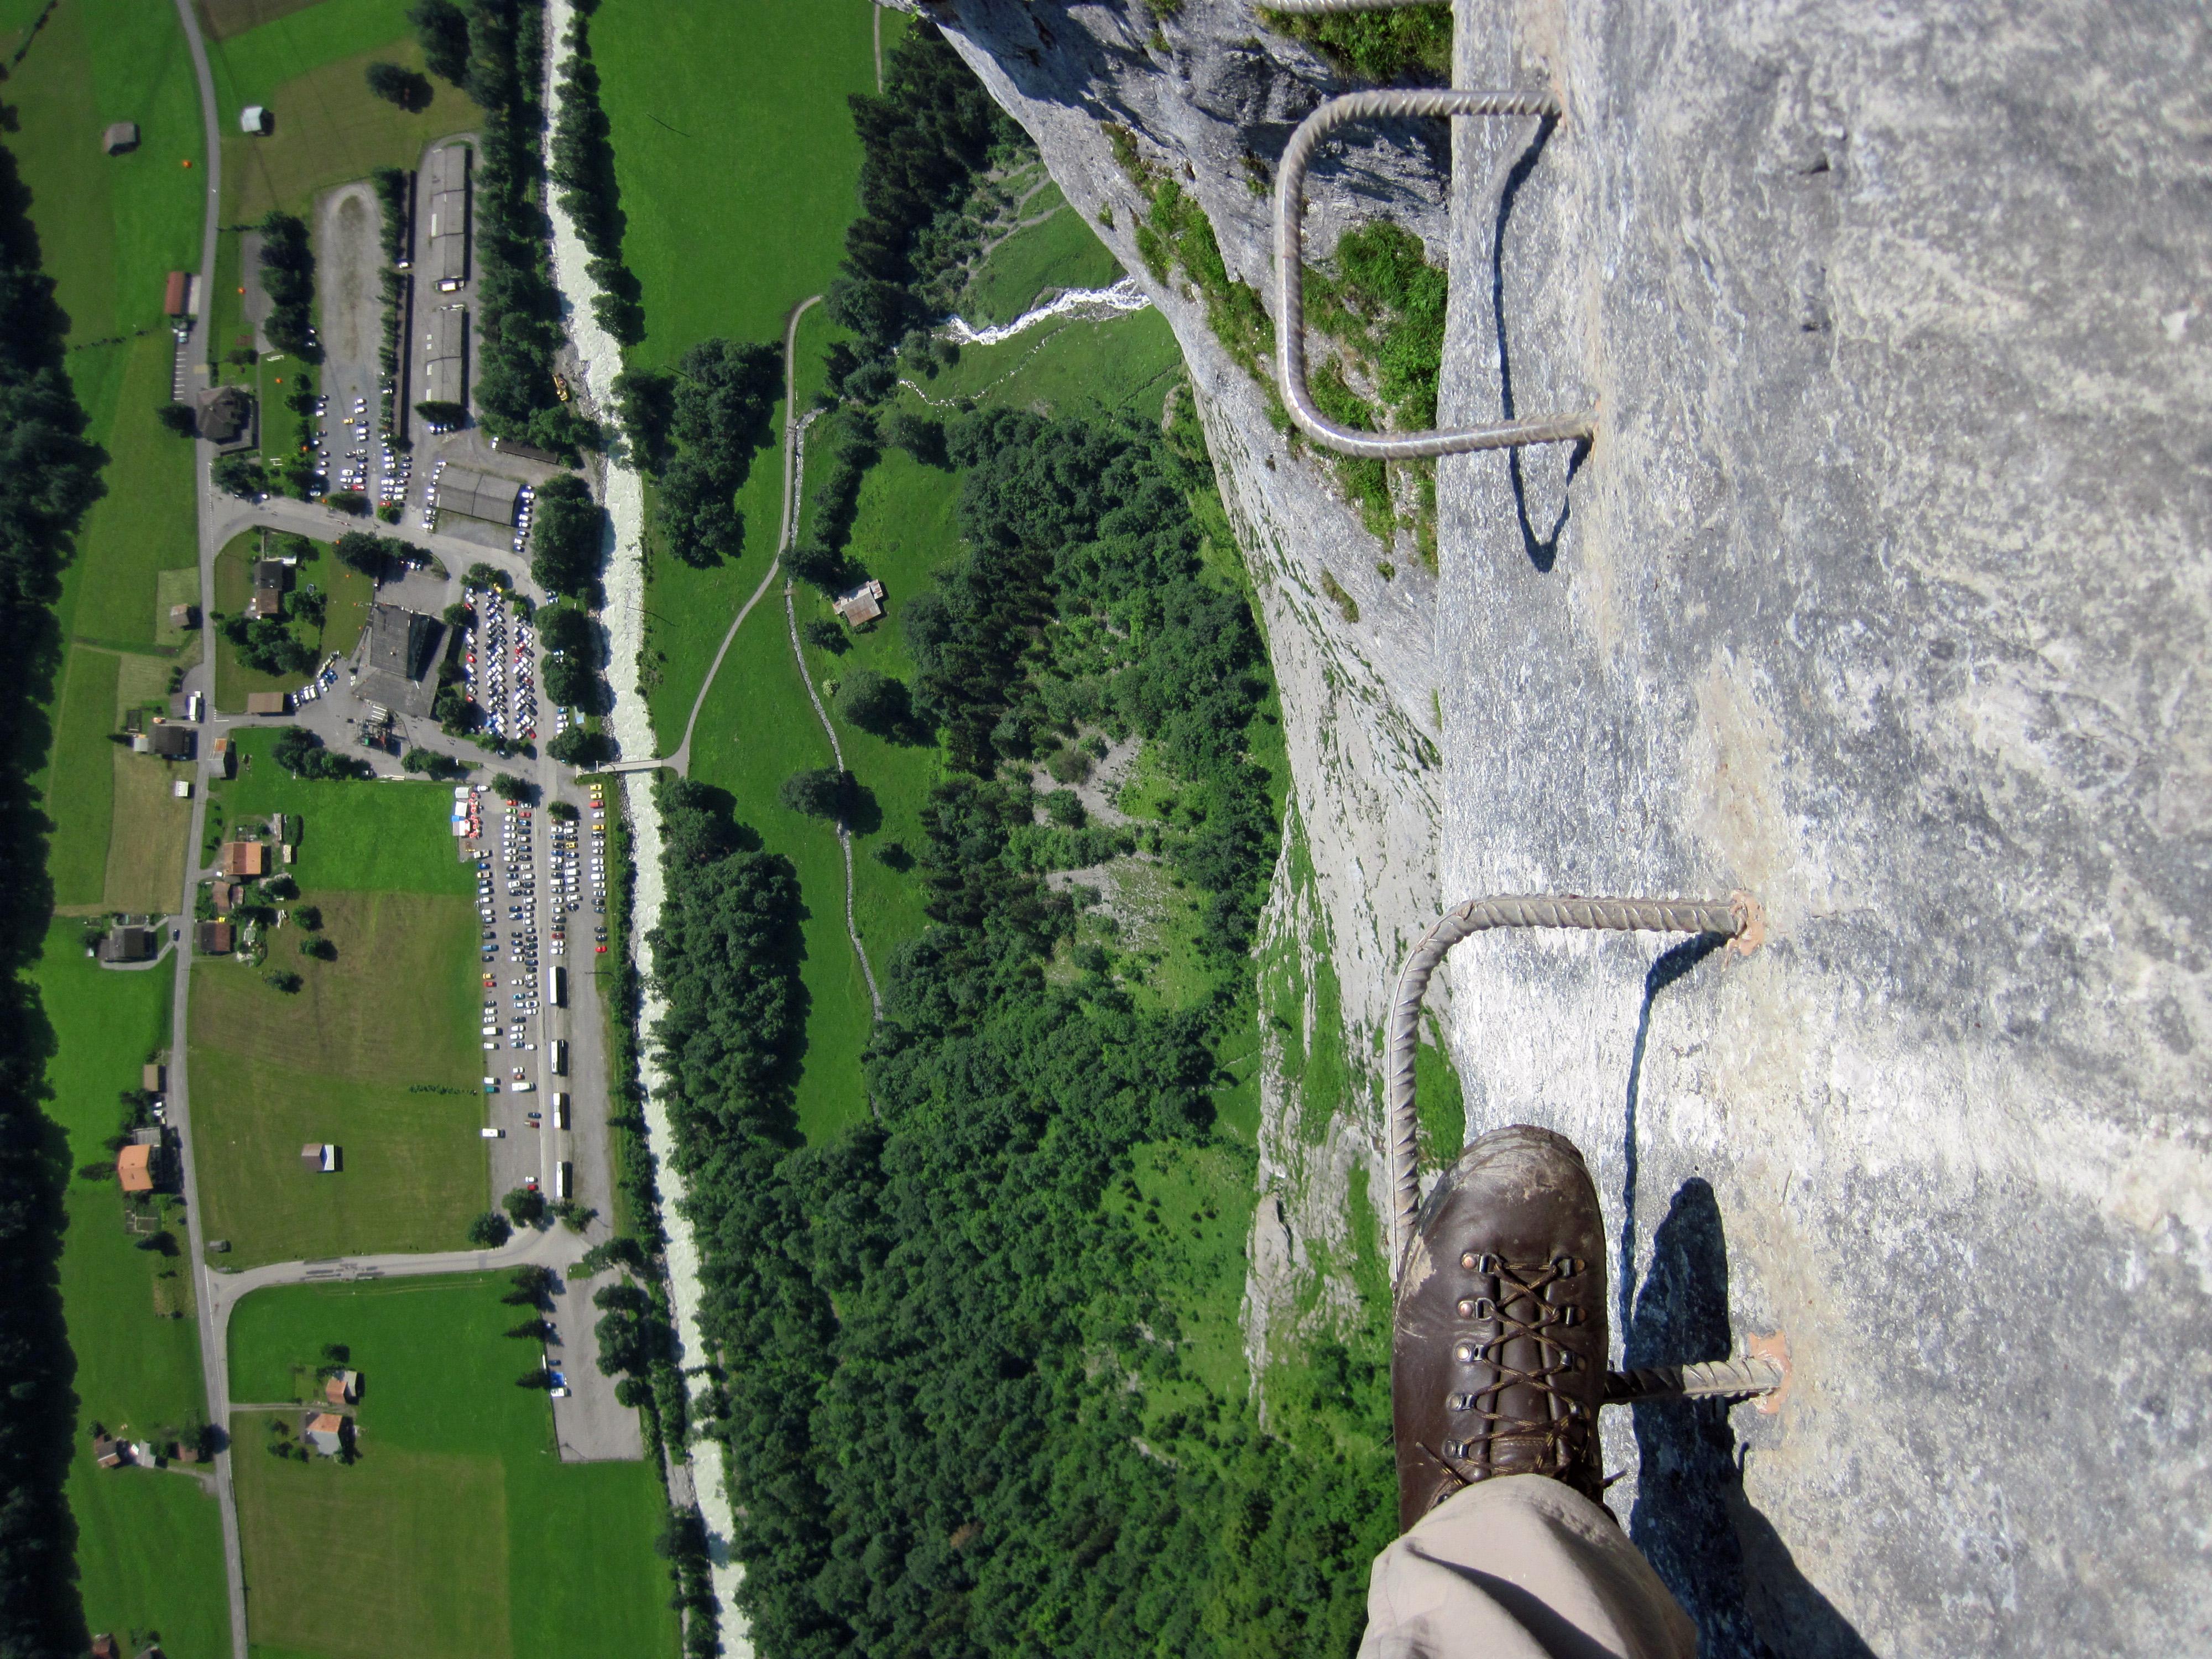 Klettersteig Lauterbrunnen : Klettersteig u the severe climber